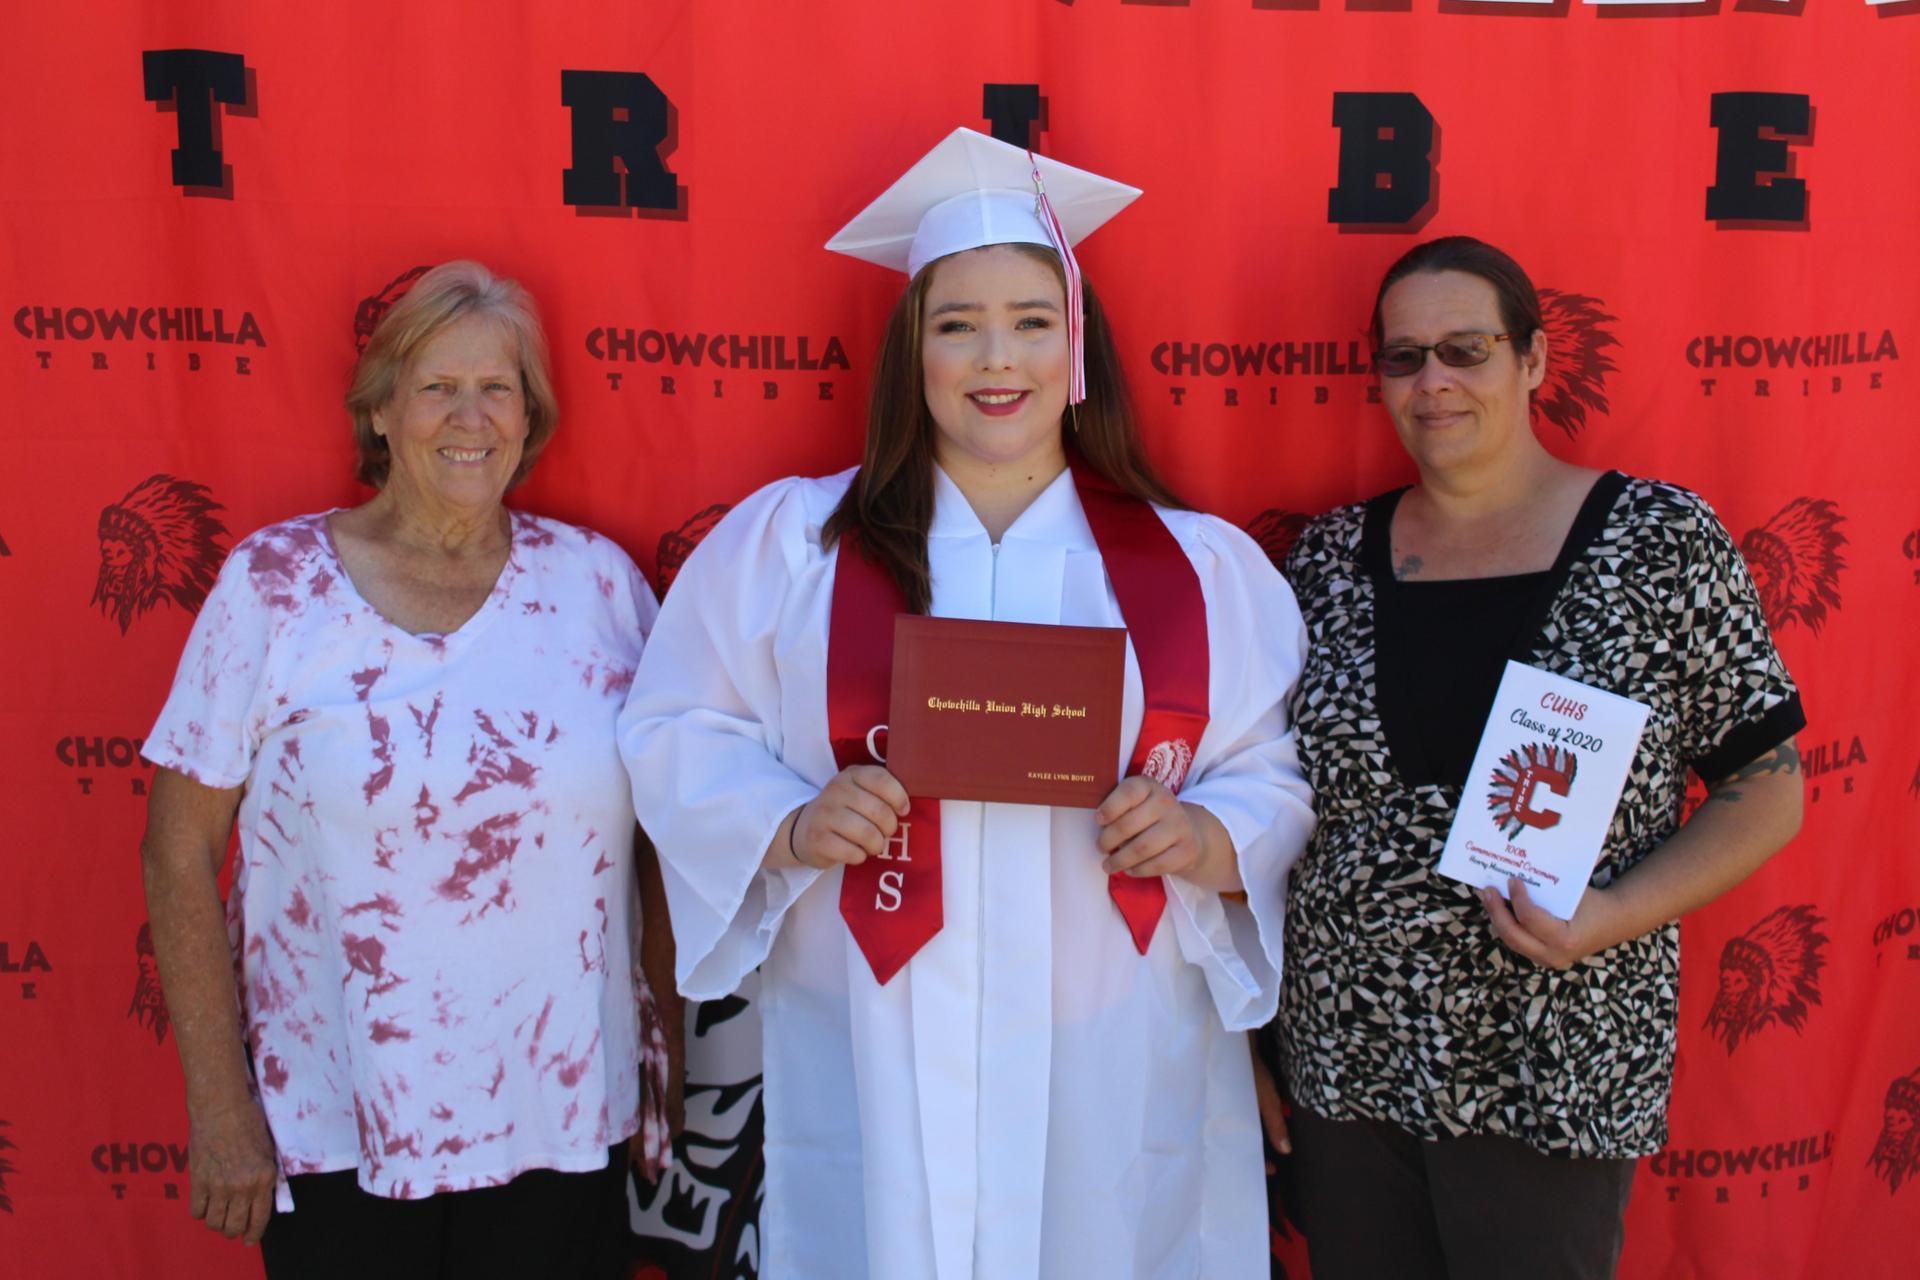 Kaylee Boyett and family